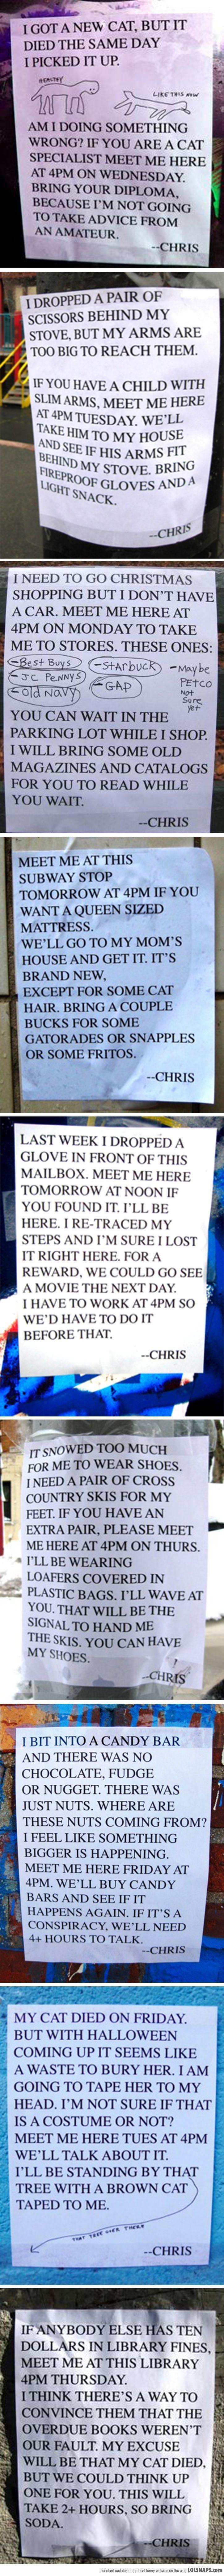 Chris Seems Like A Pretty Great Guy.